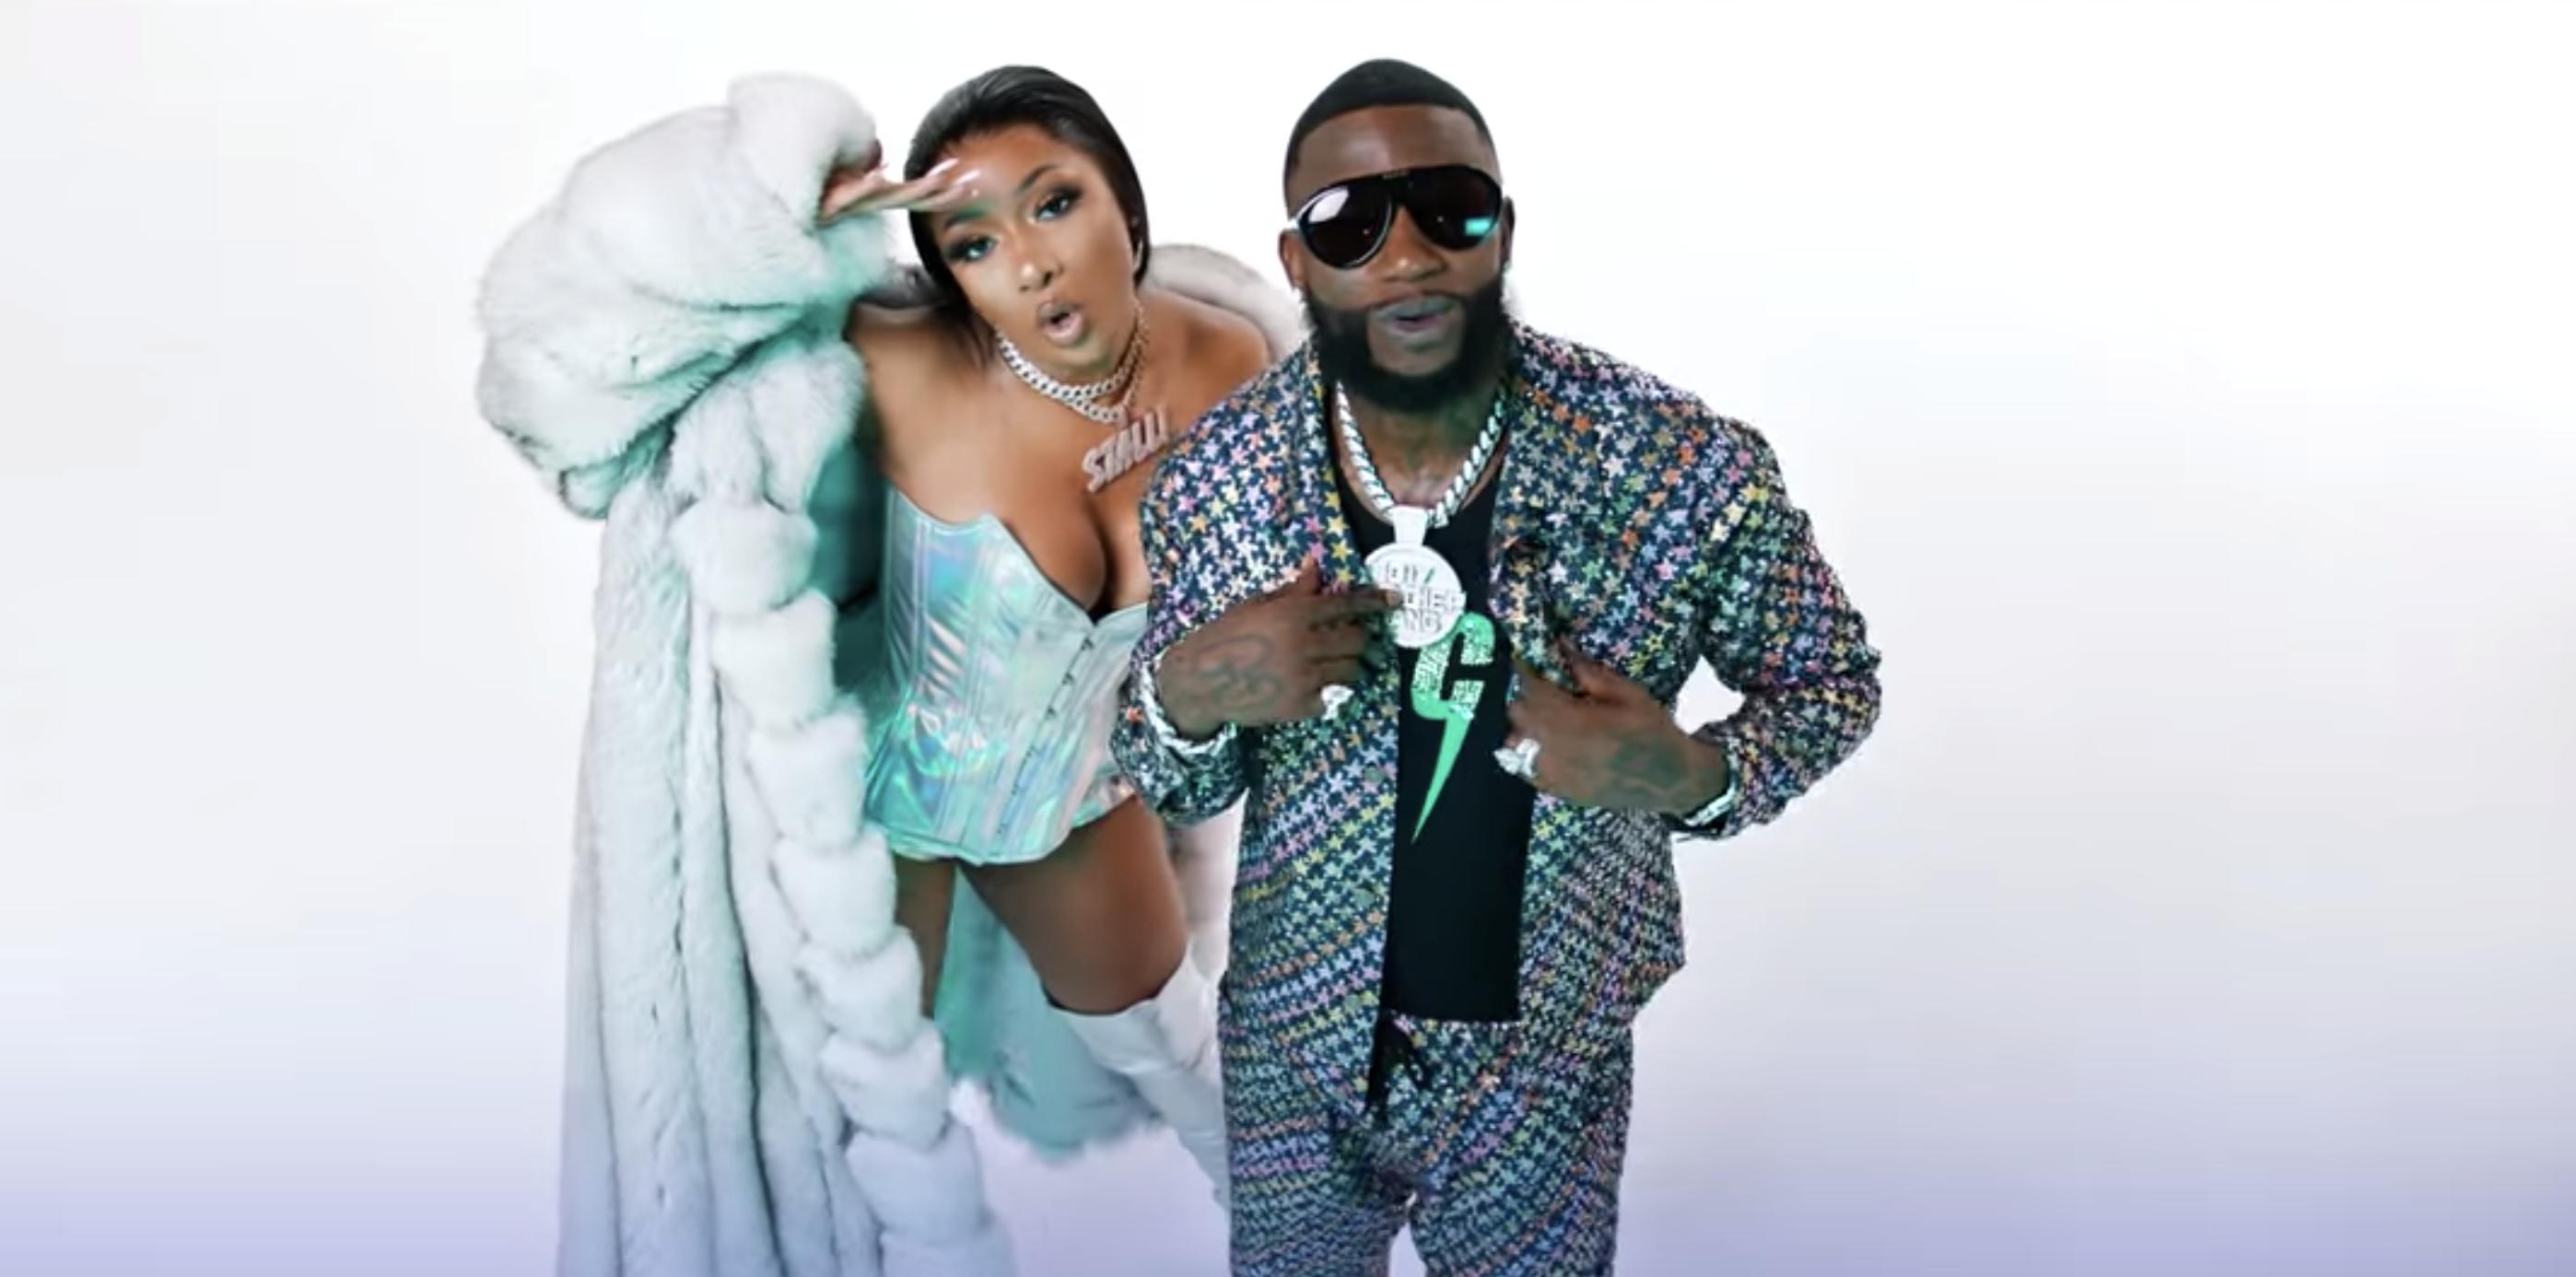 Gucci Mane feat. Megan Thee Stallion - Big Booty | 16BARS.DE